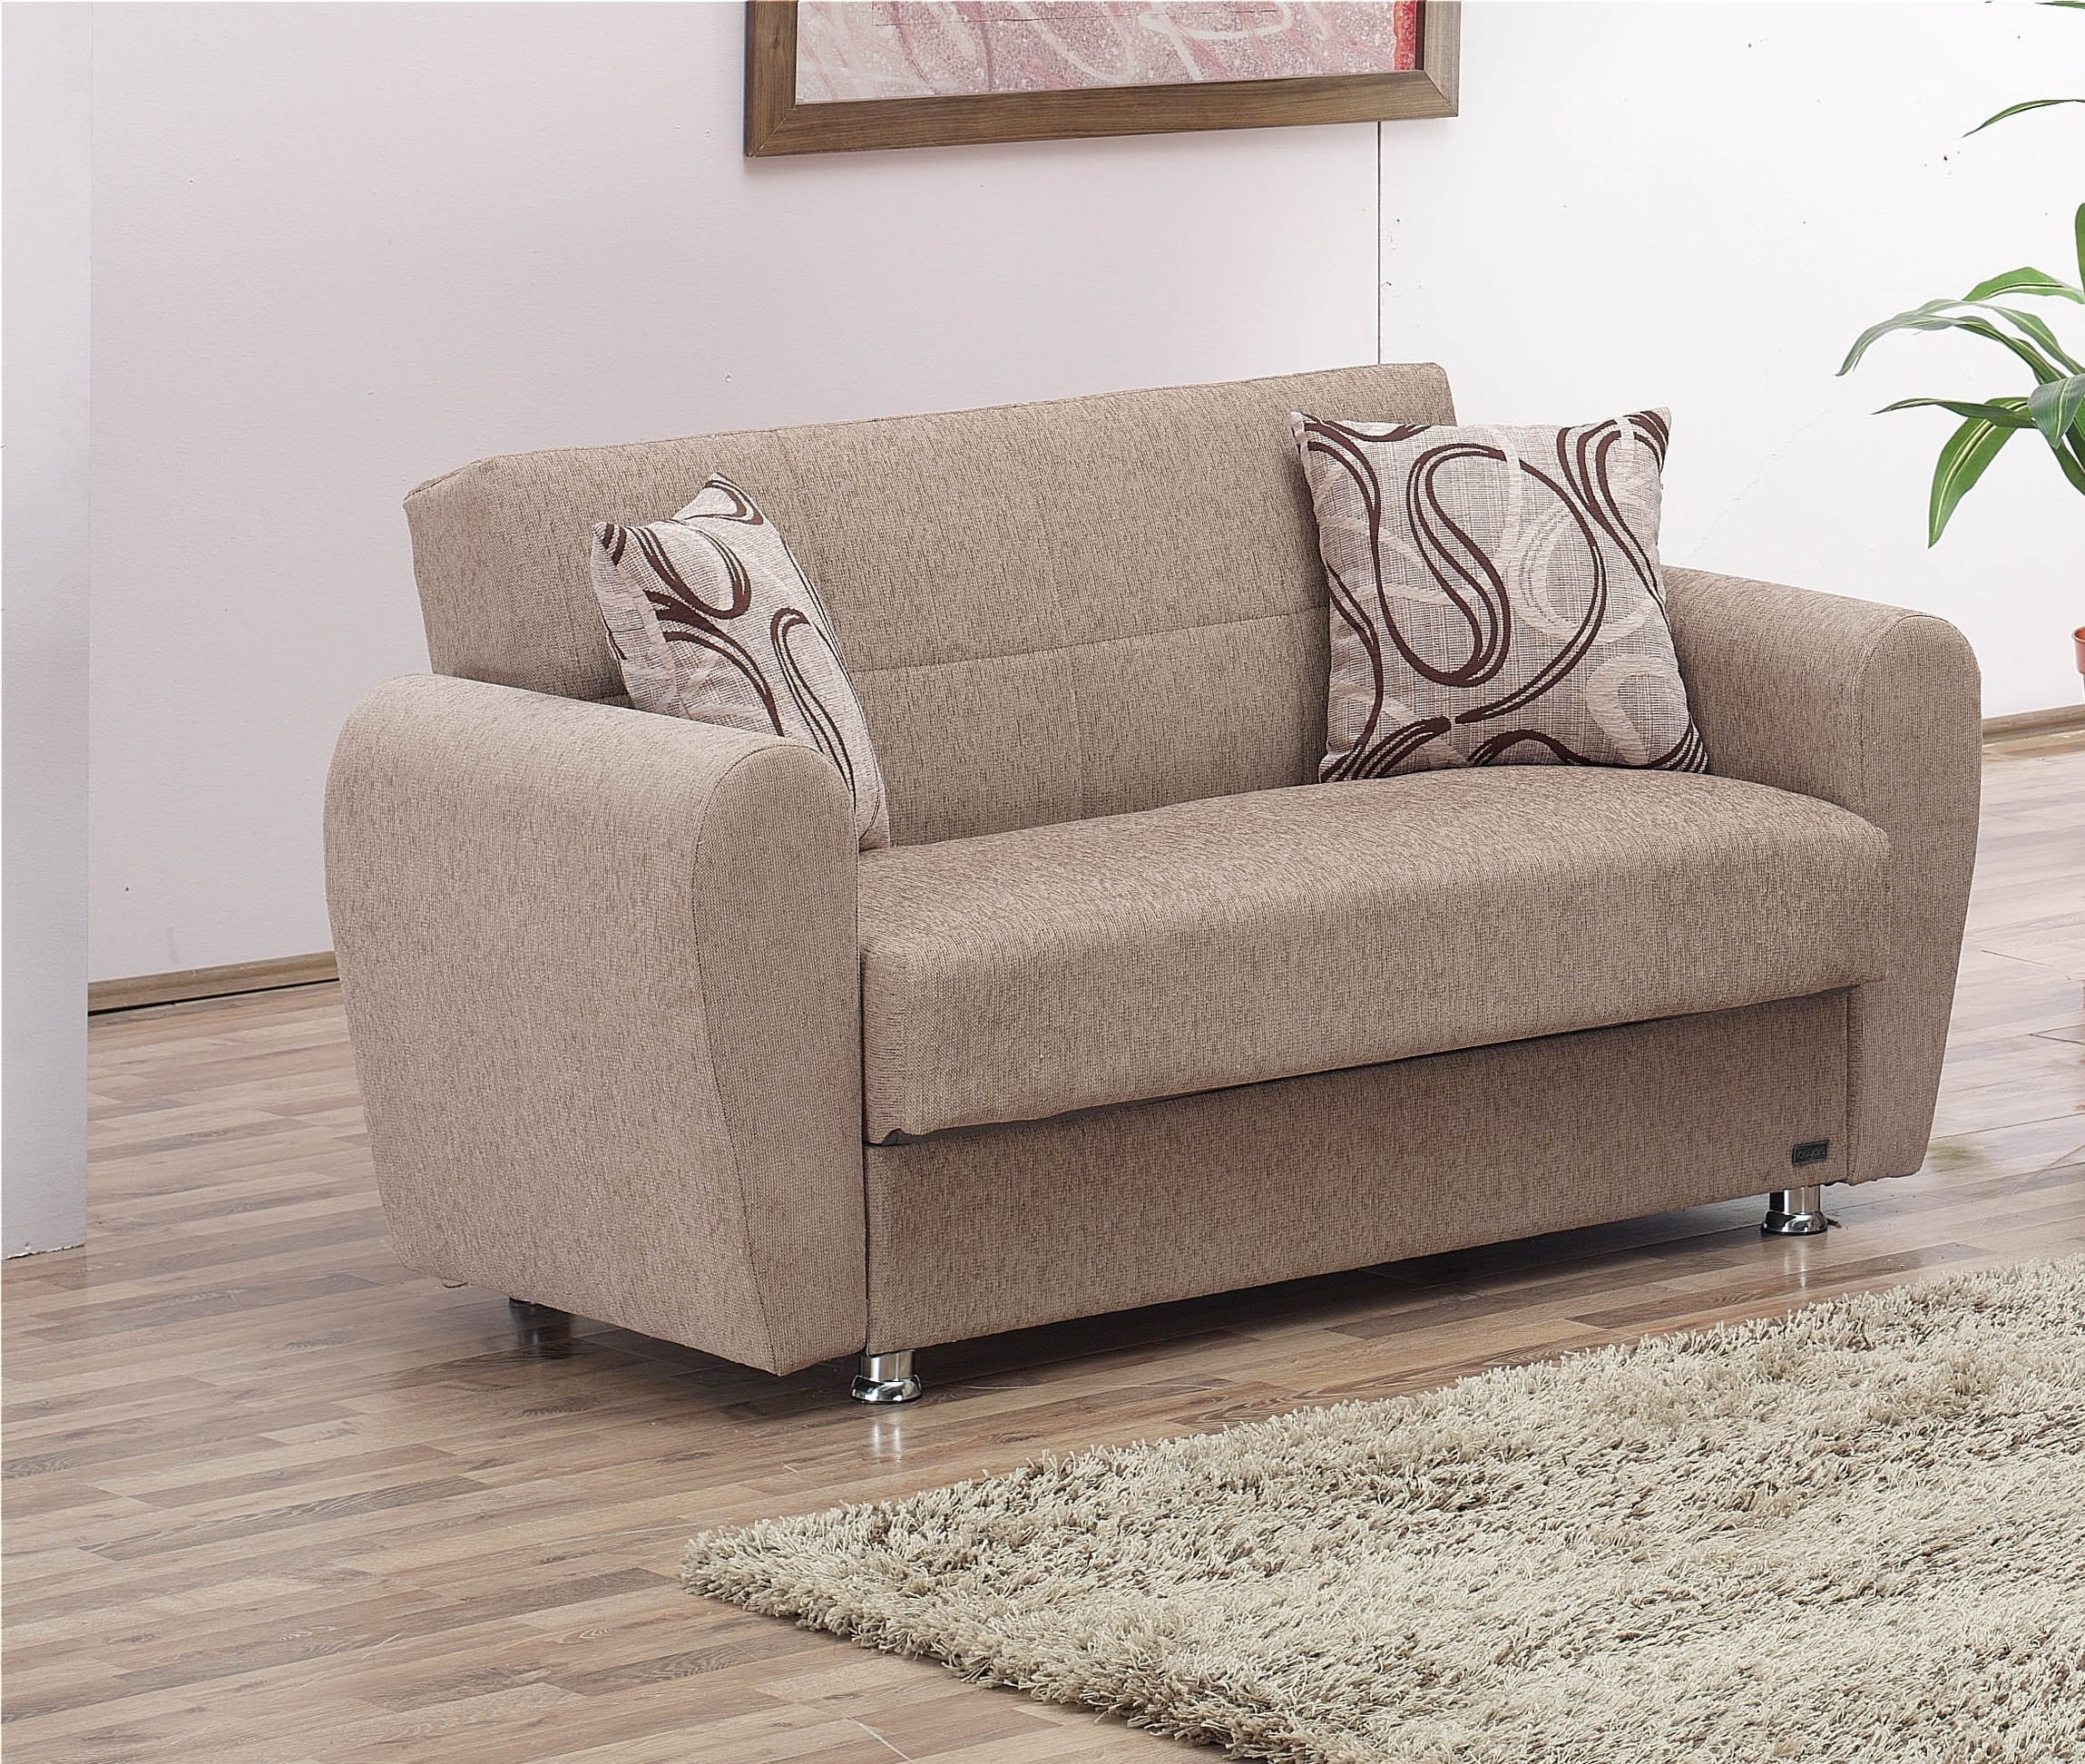 Colorado Loveseat By Empire Furniture USA